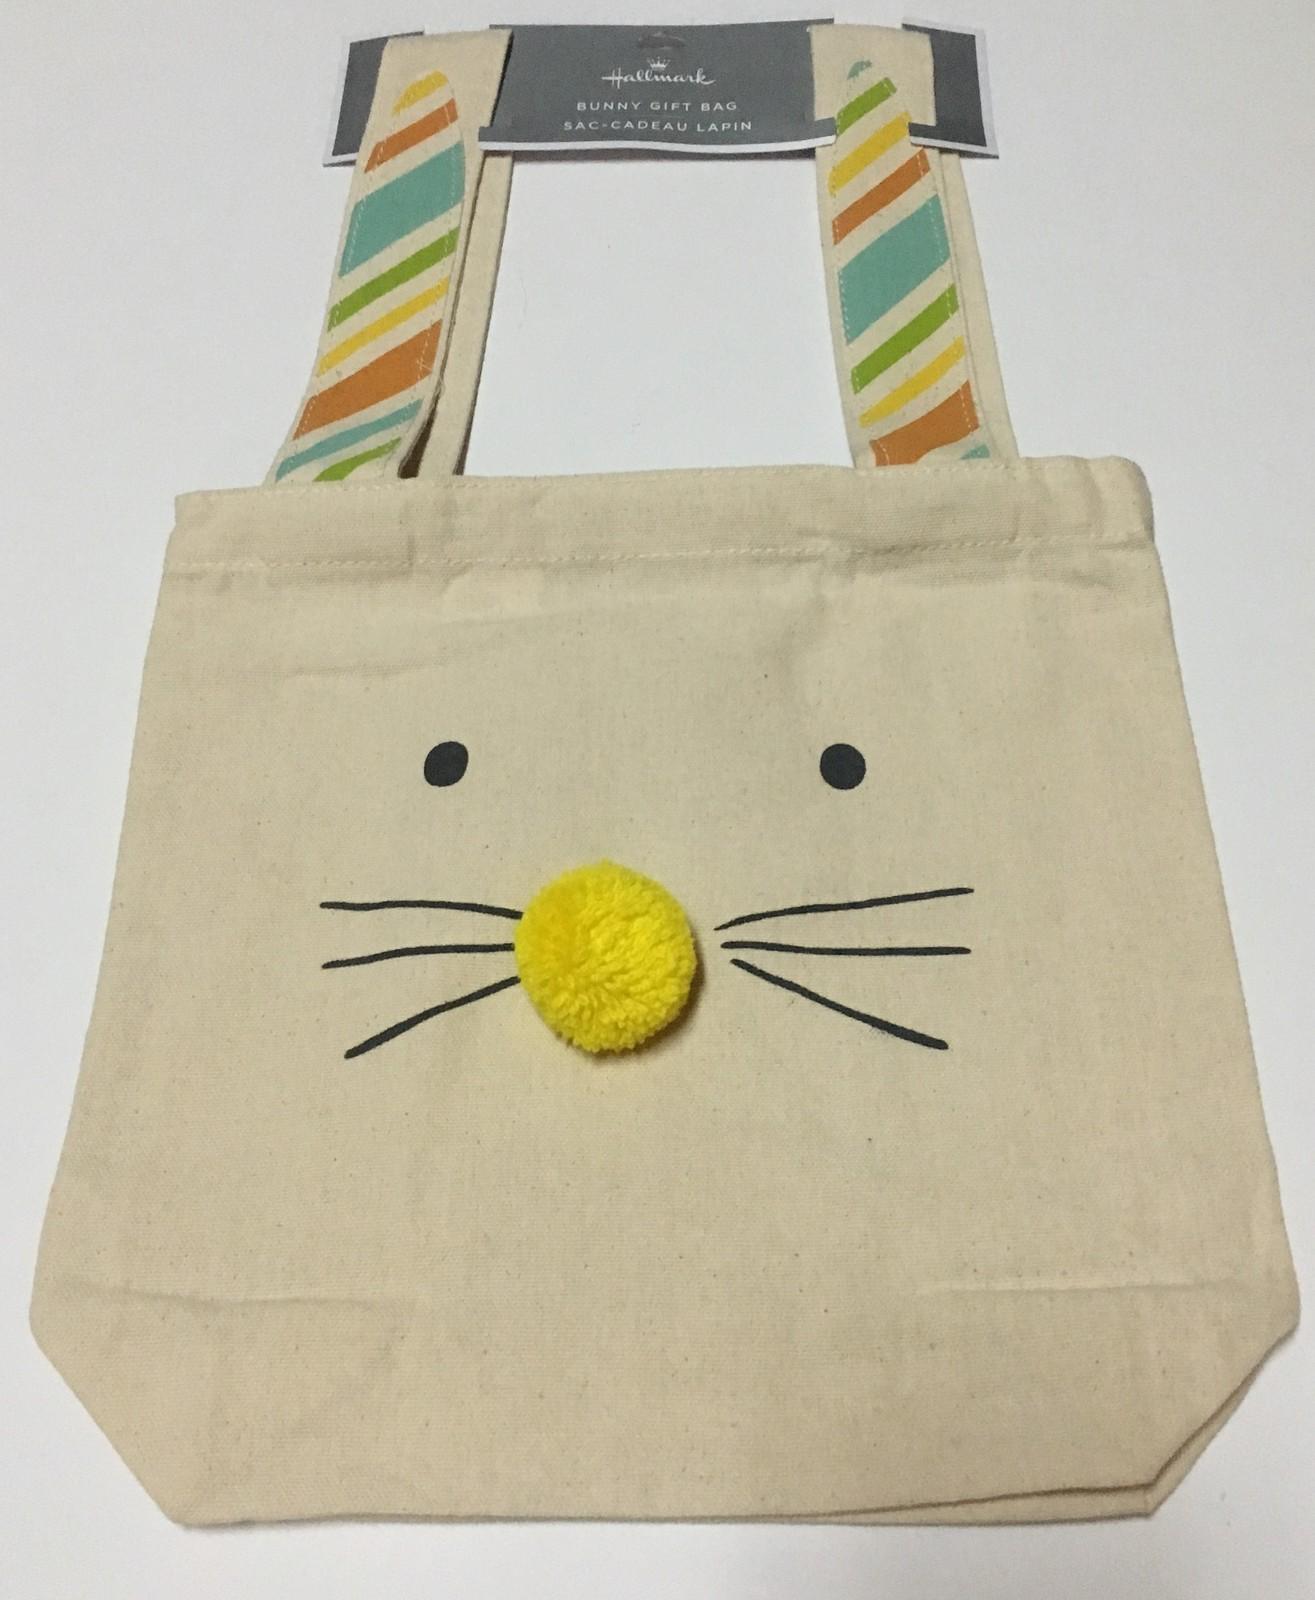 "Hallmark Bunny Gift Bag Burlap 18"" x 10"" x 3"" Bunny Face NWT"